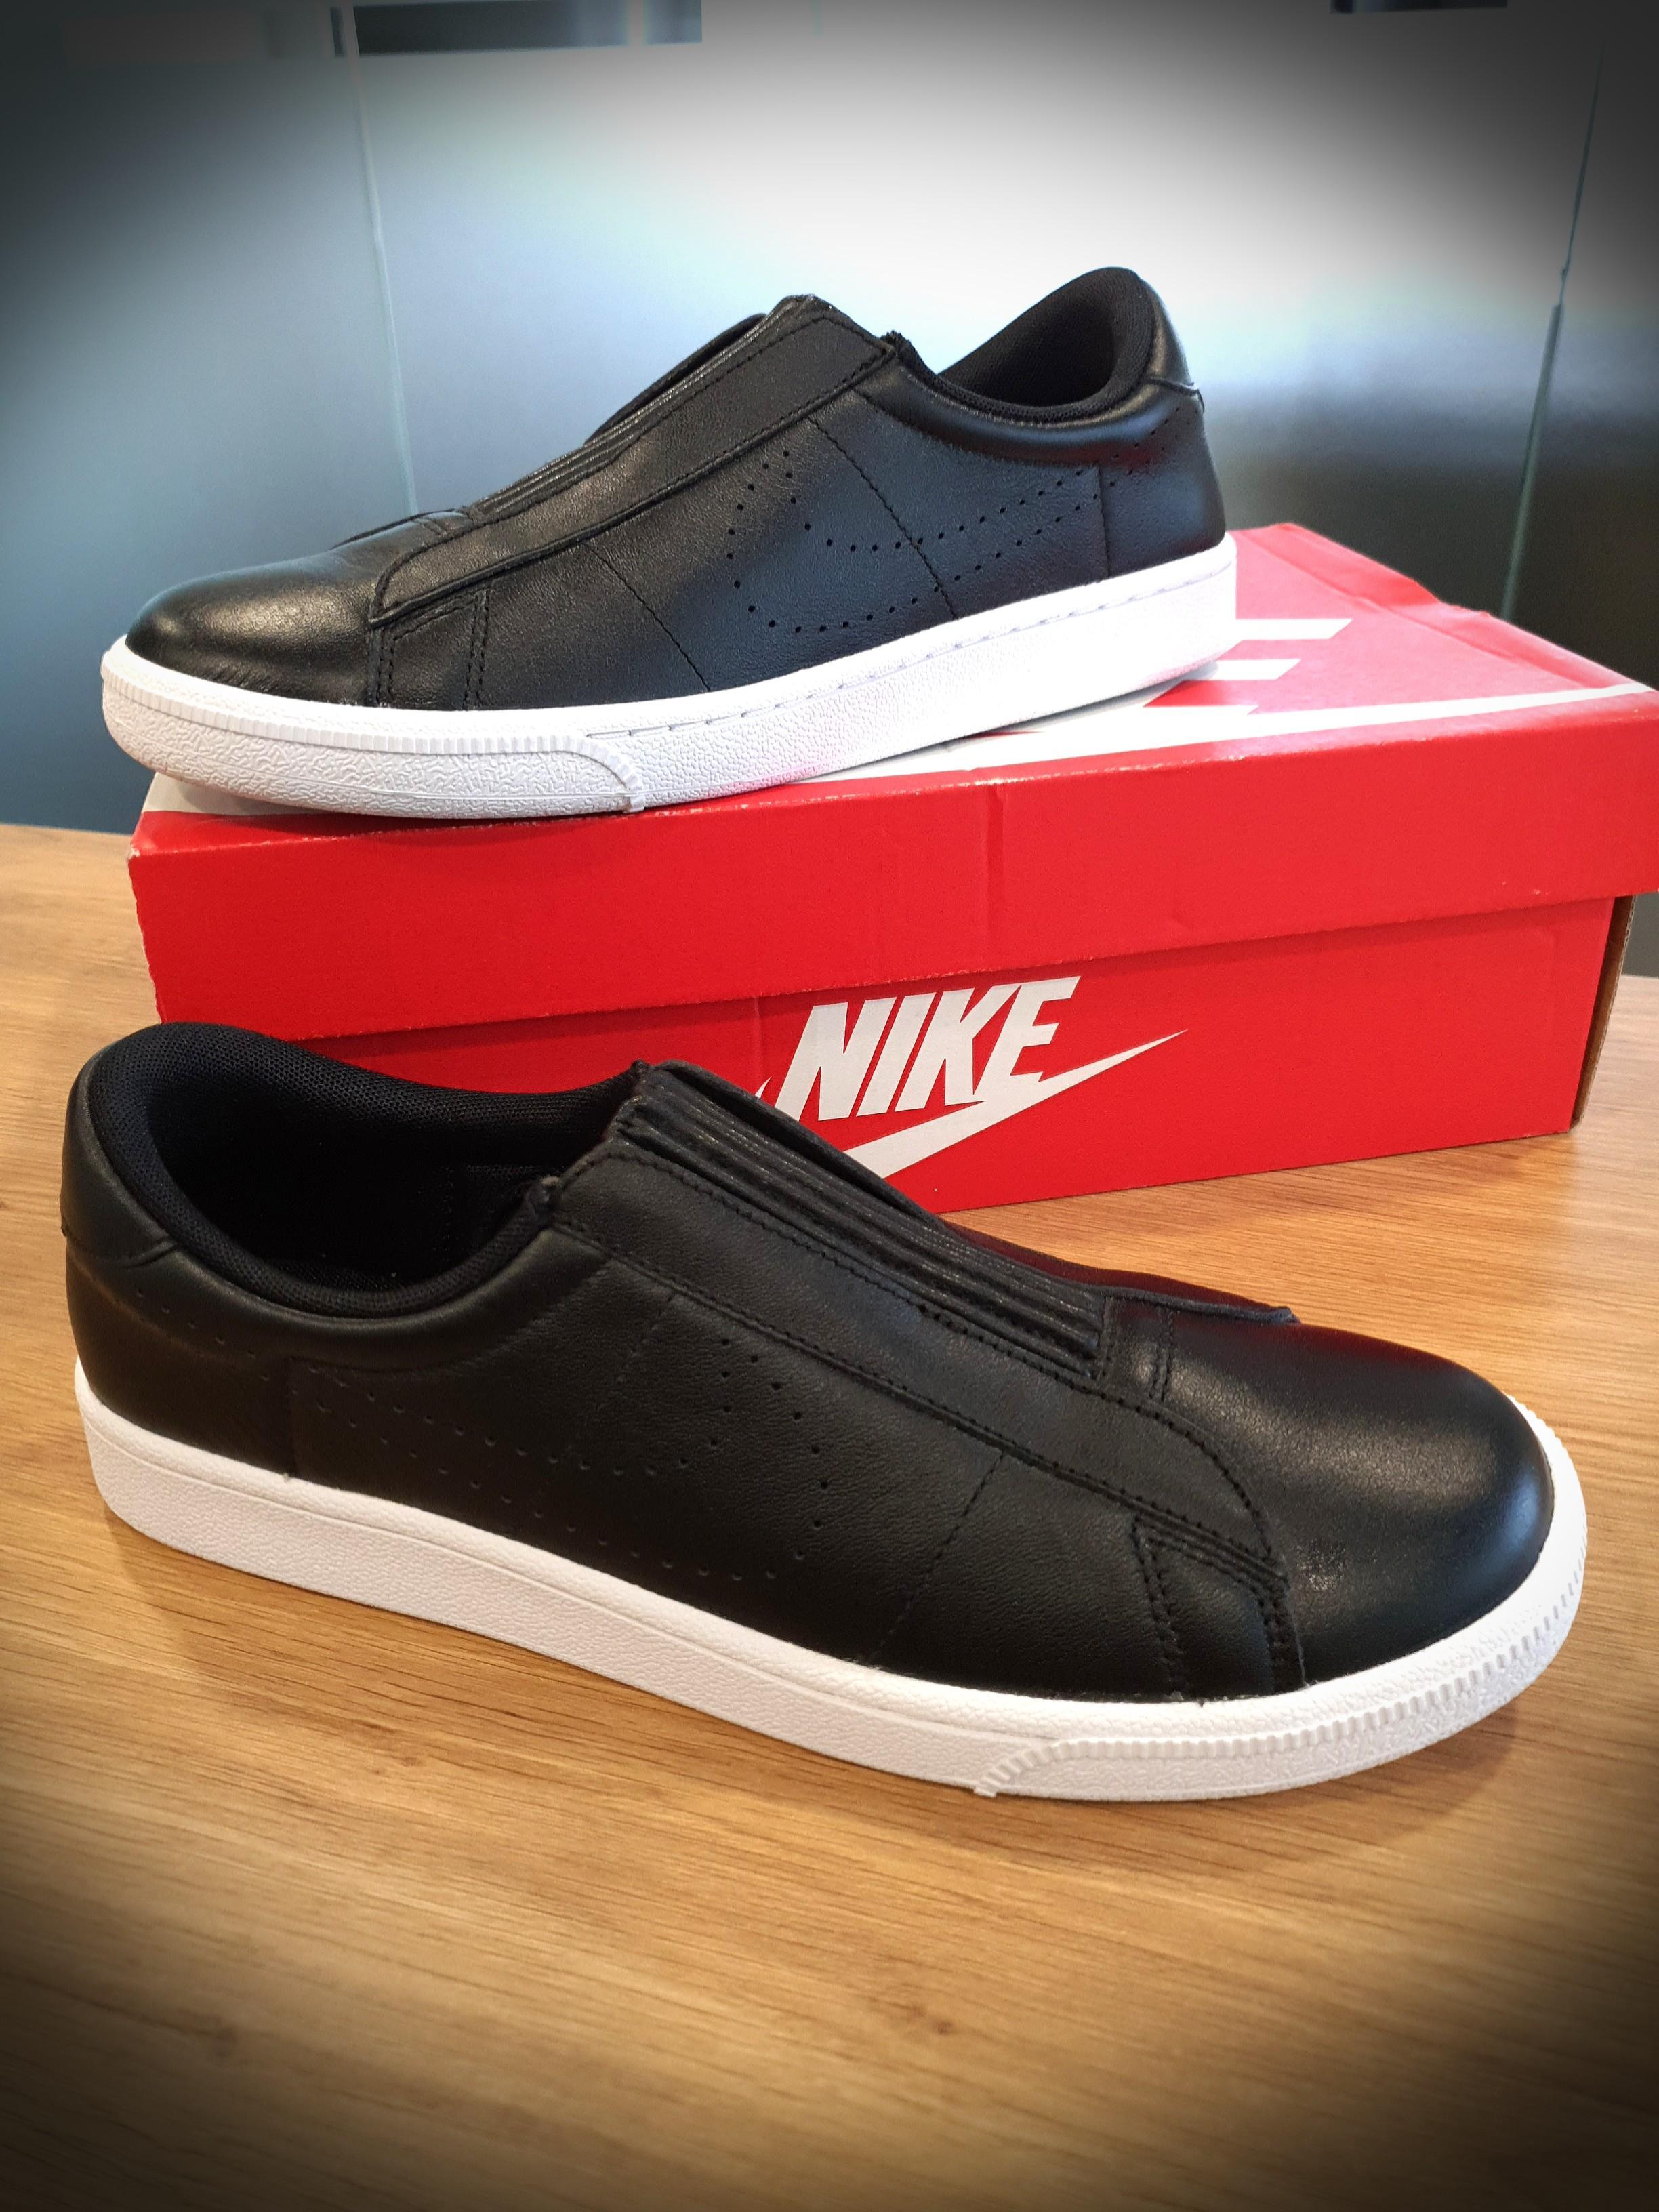 75% Discount. Nike Women Sneakers